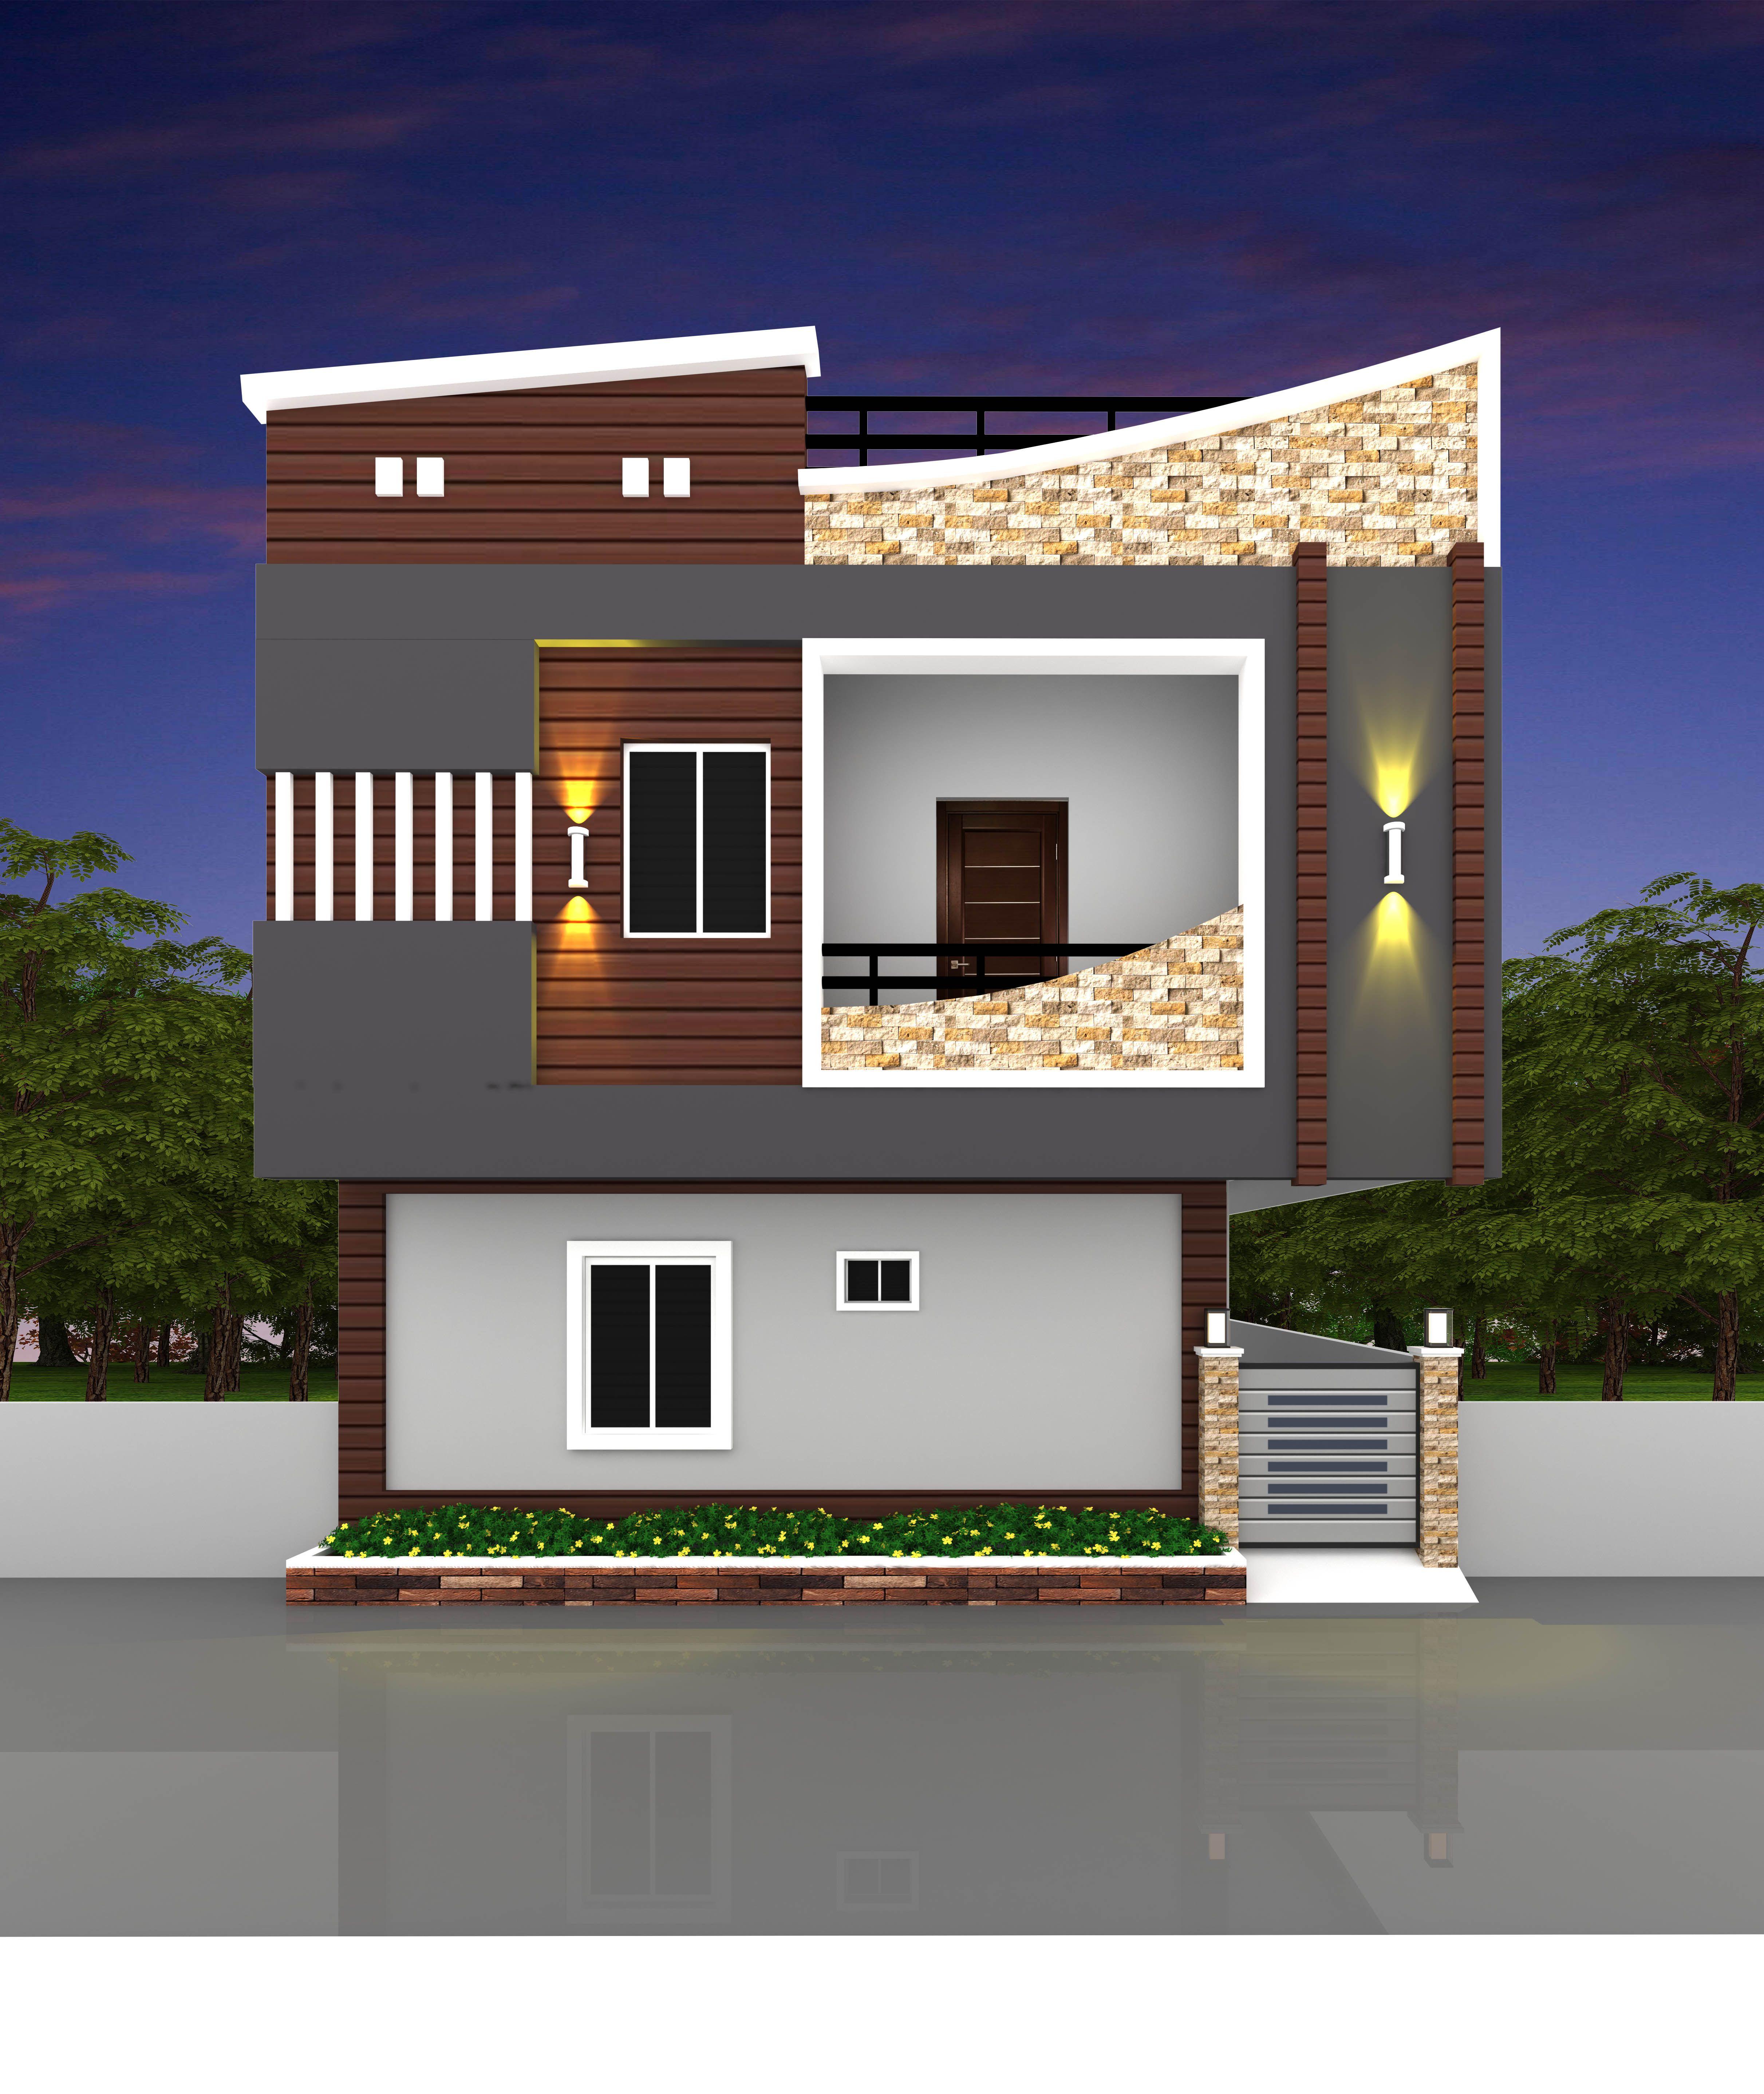 Elevation Design House Balcony Design Small House Elevation Design Your Dream House